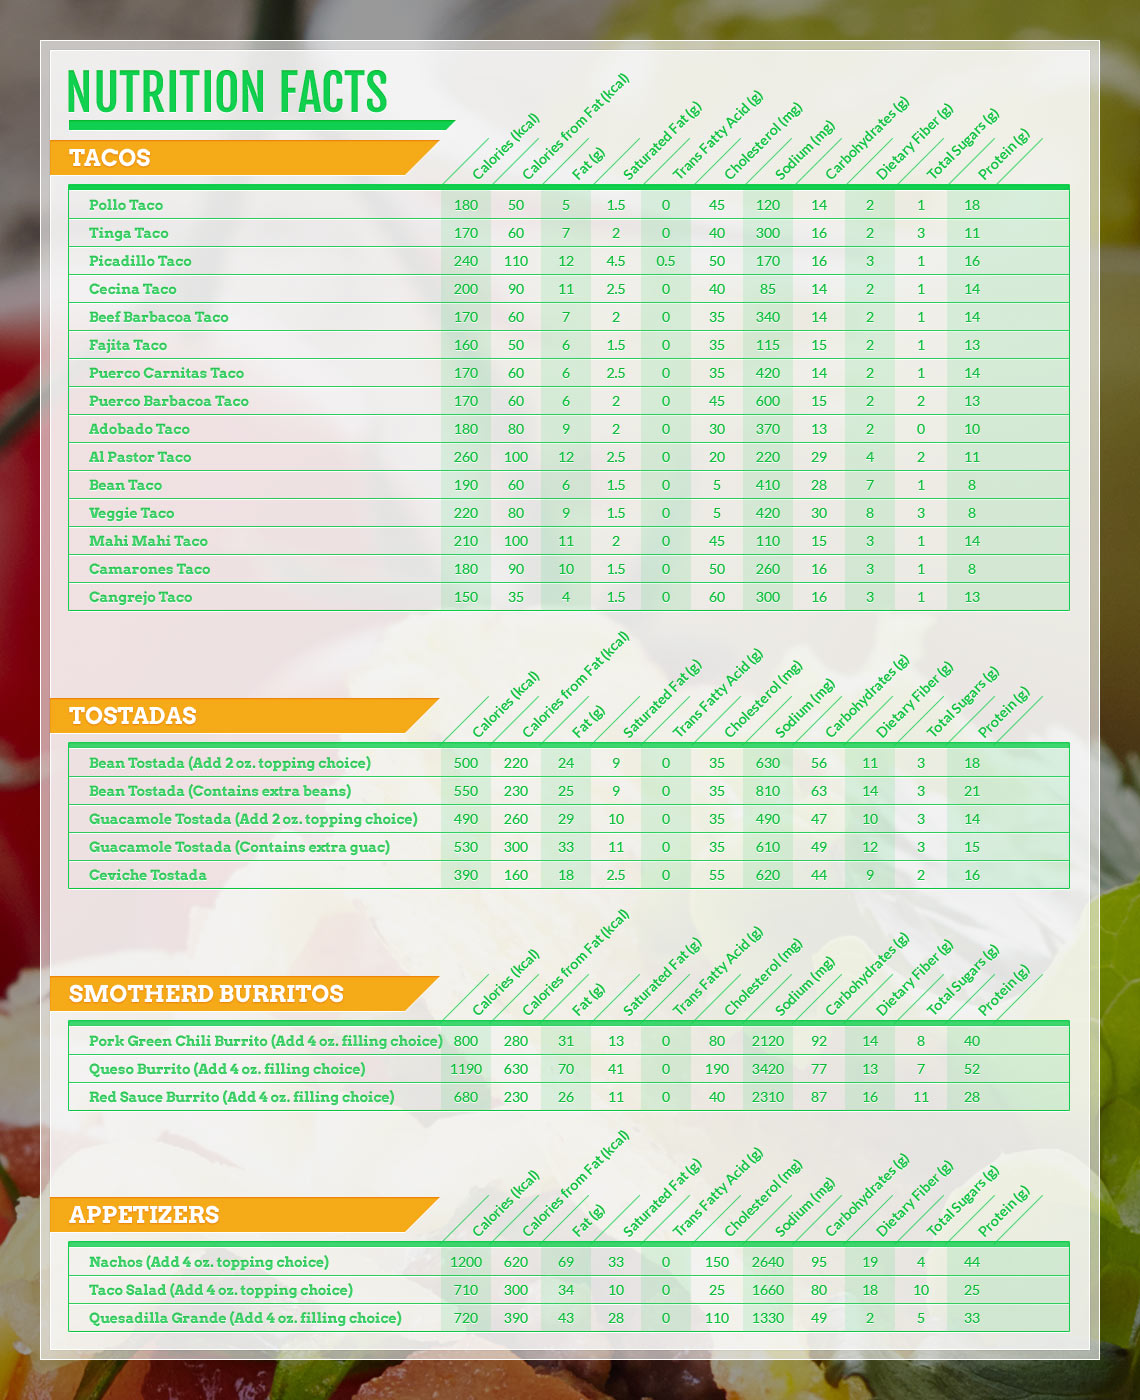 yolandas_infographic1